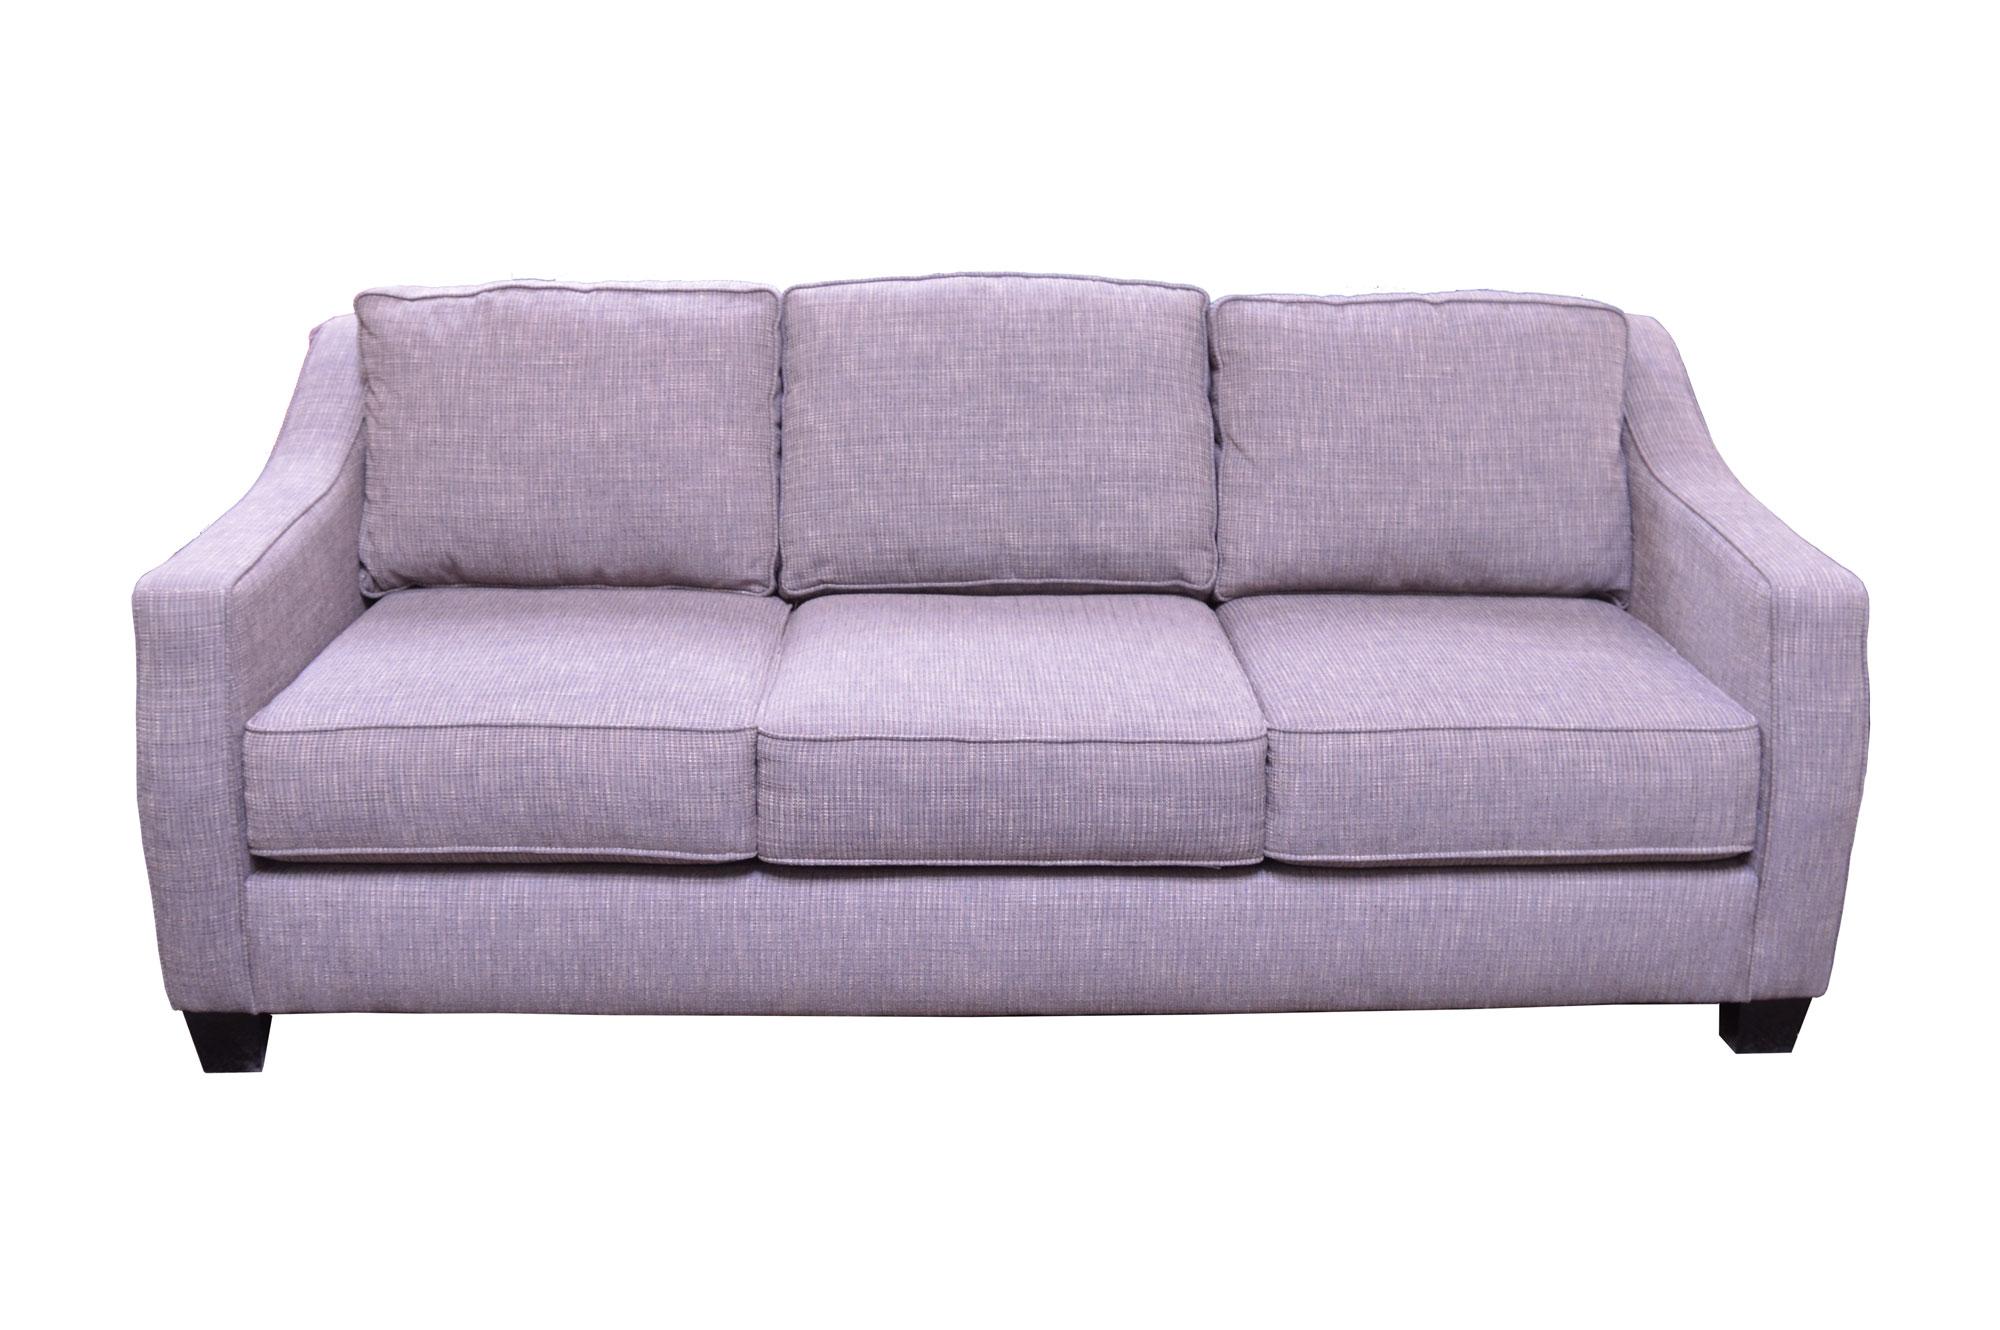 sofas for less jennifer convertibles sofa beds 4 custom 49 photos reviews